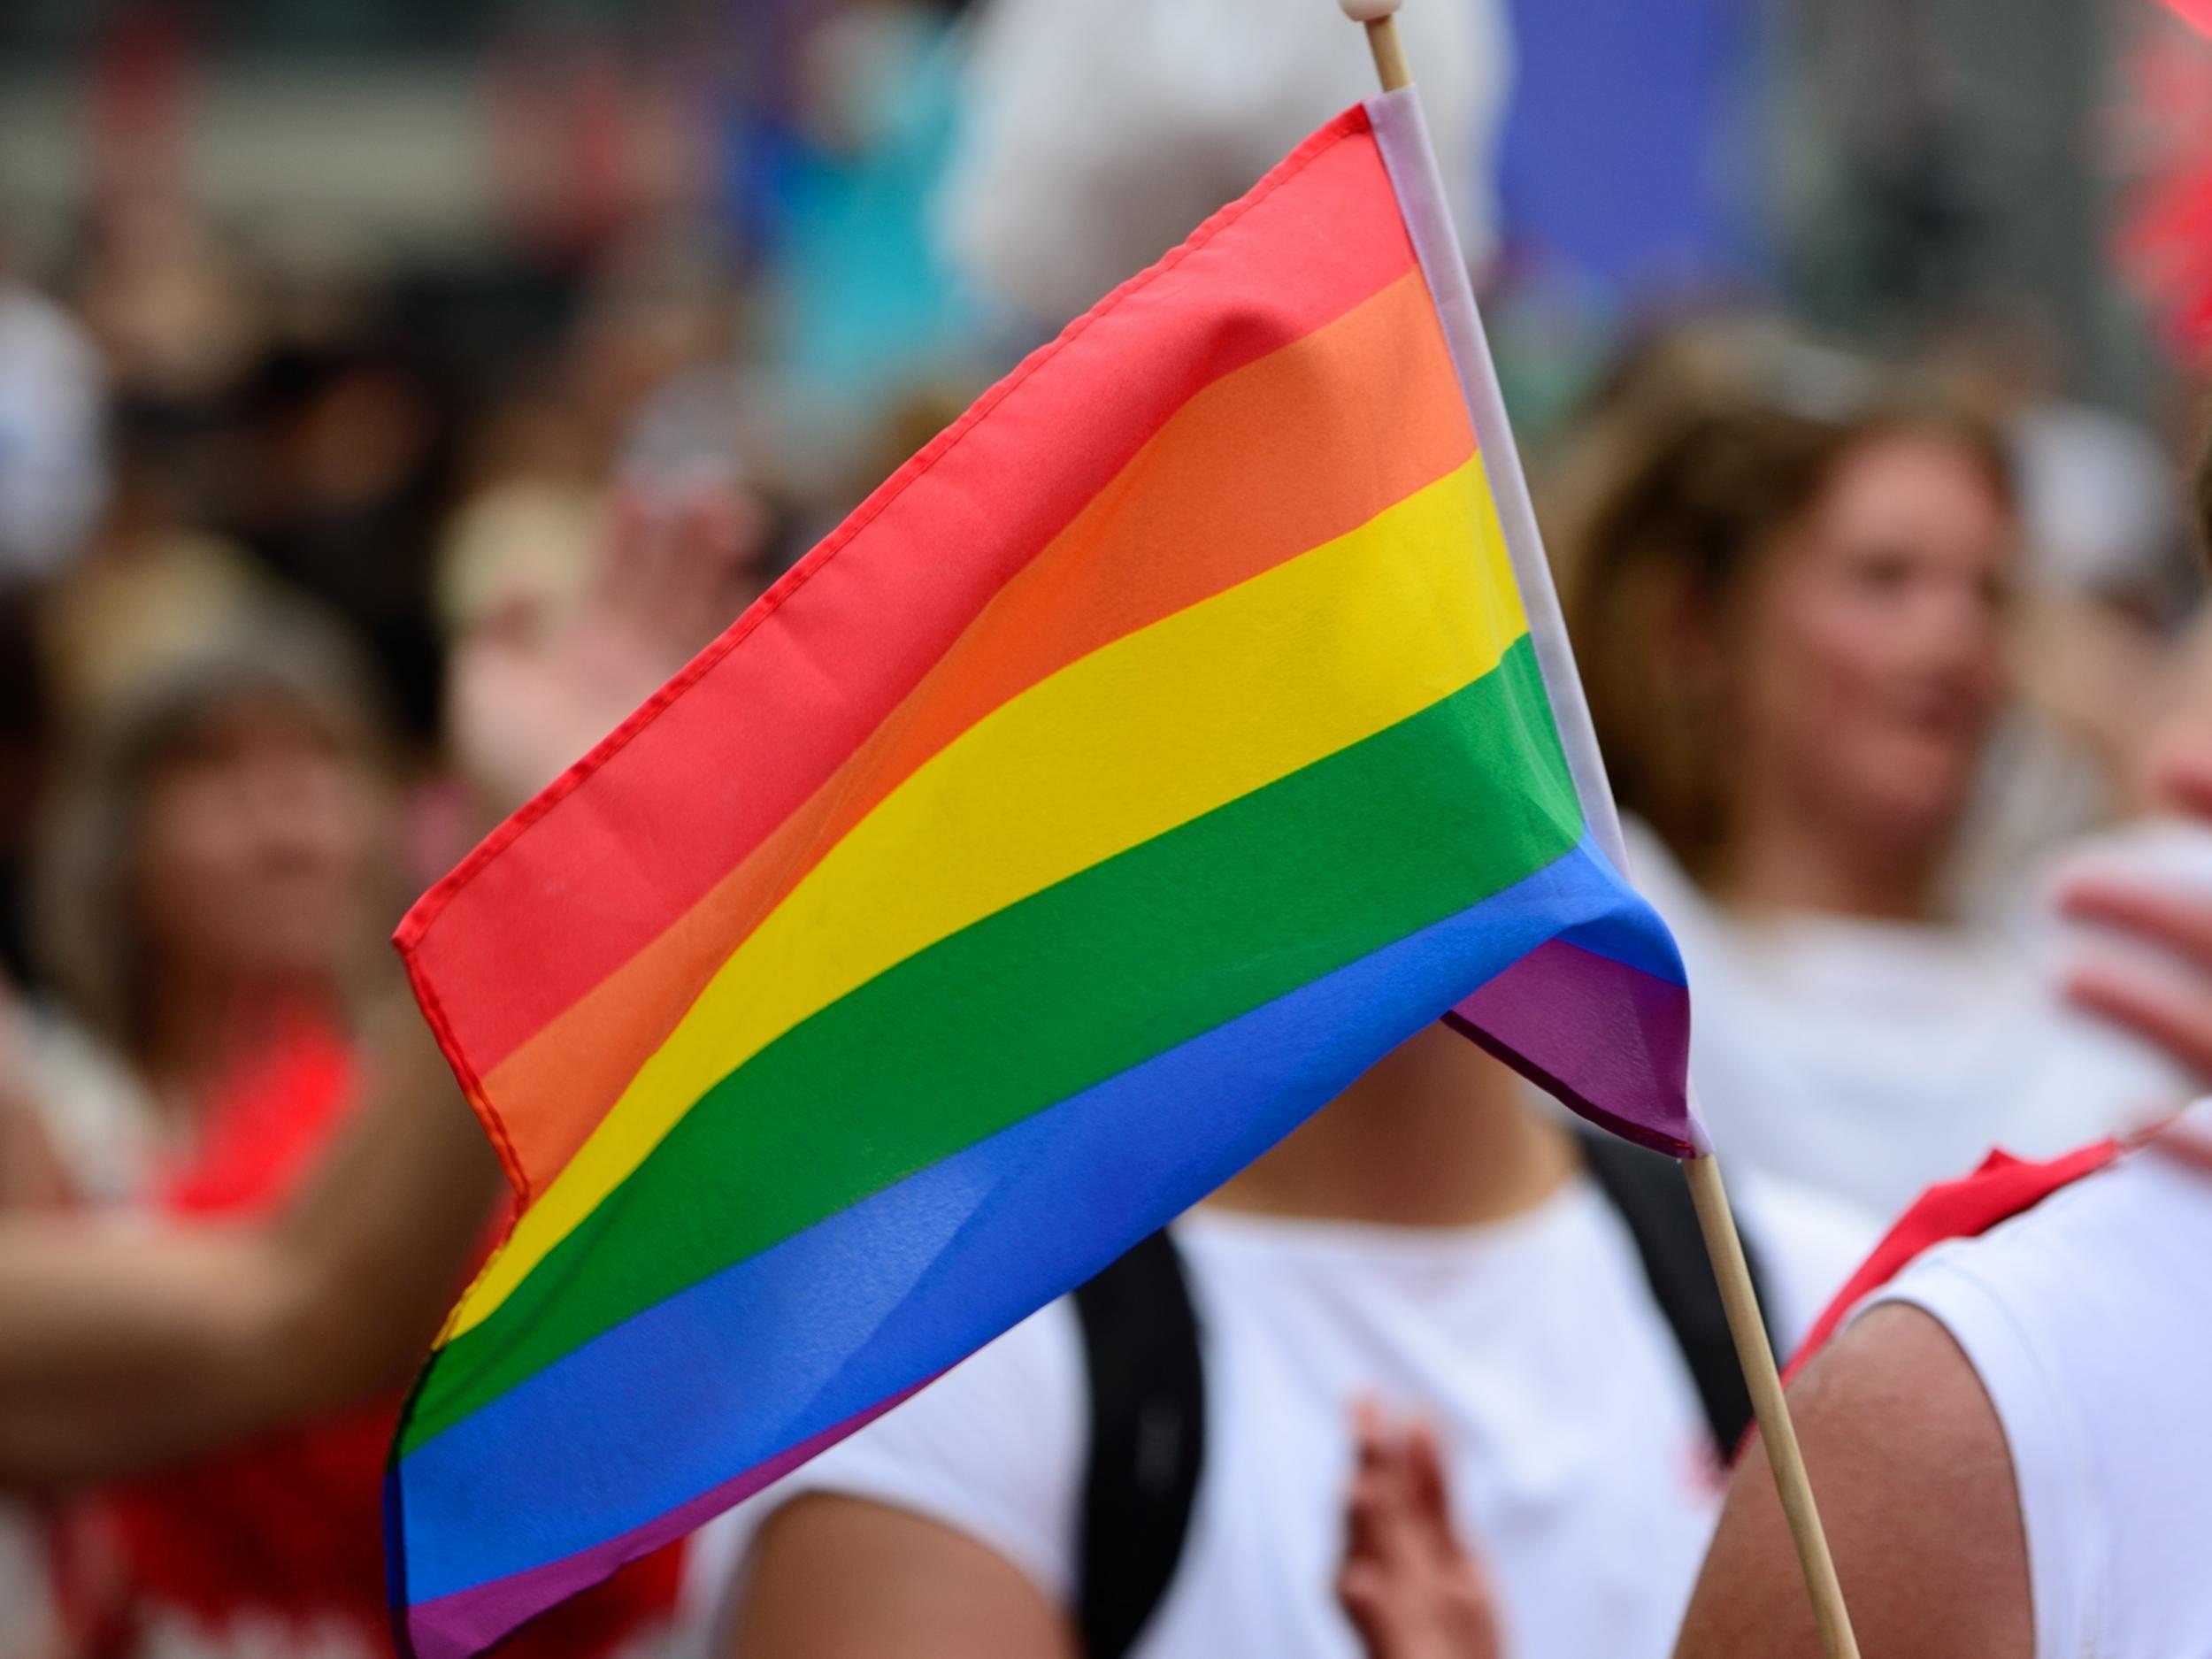 Intolerância LGBT